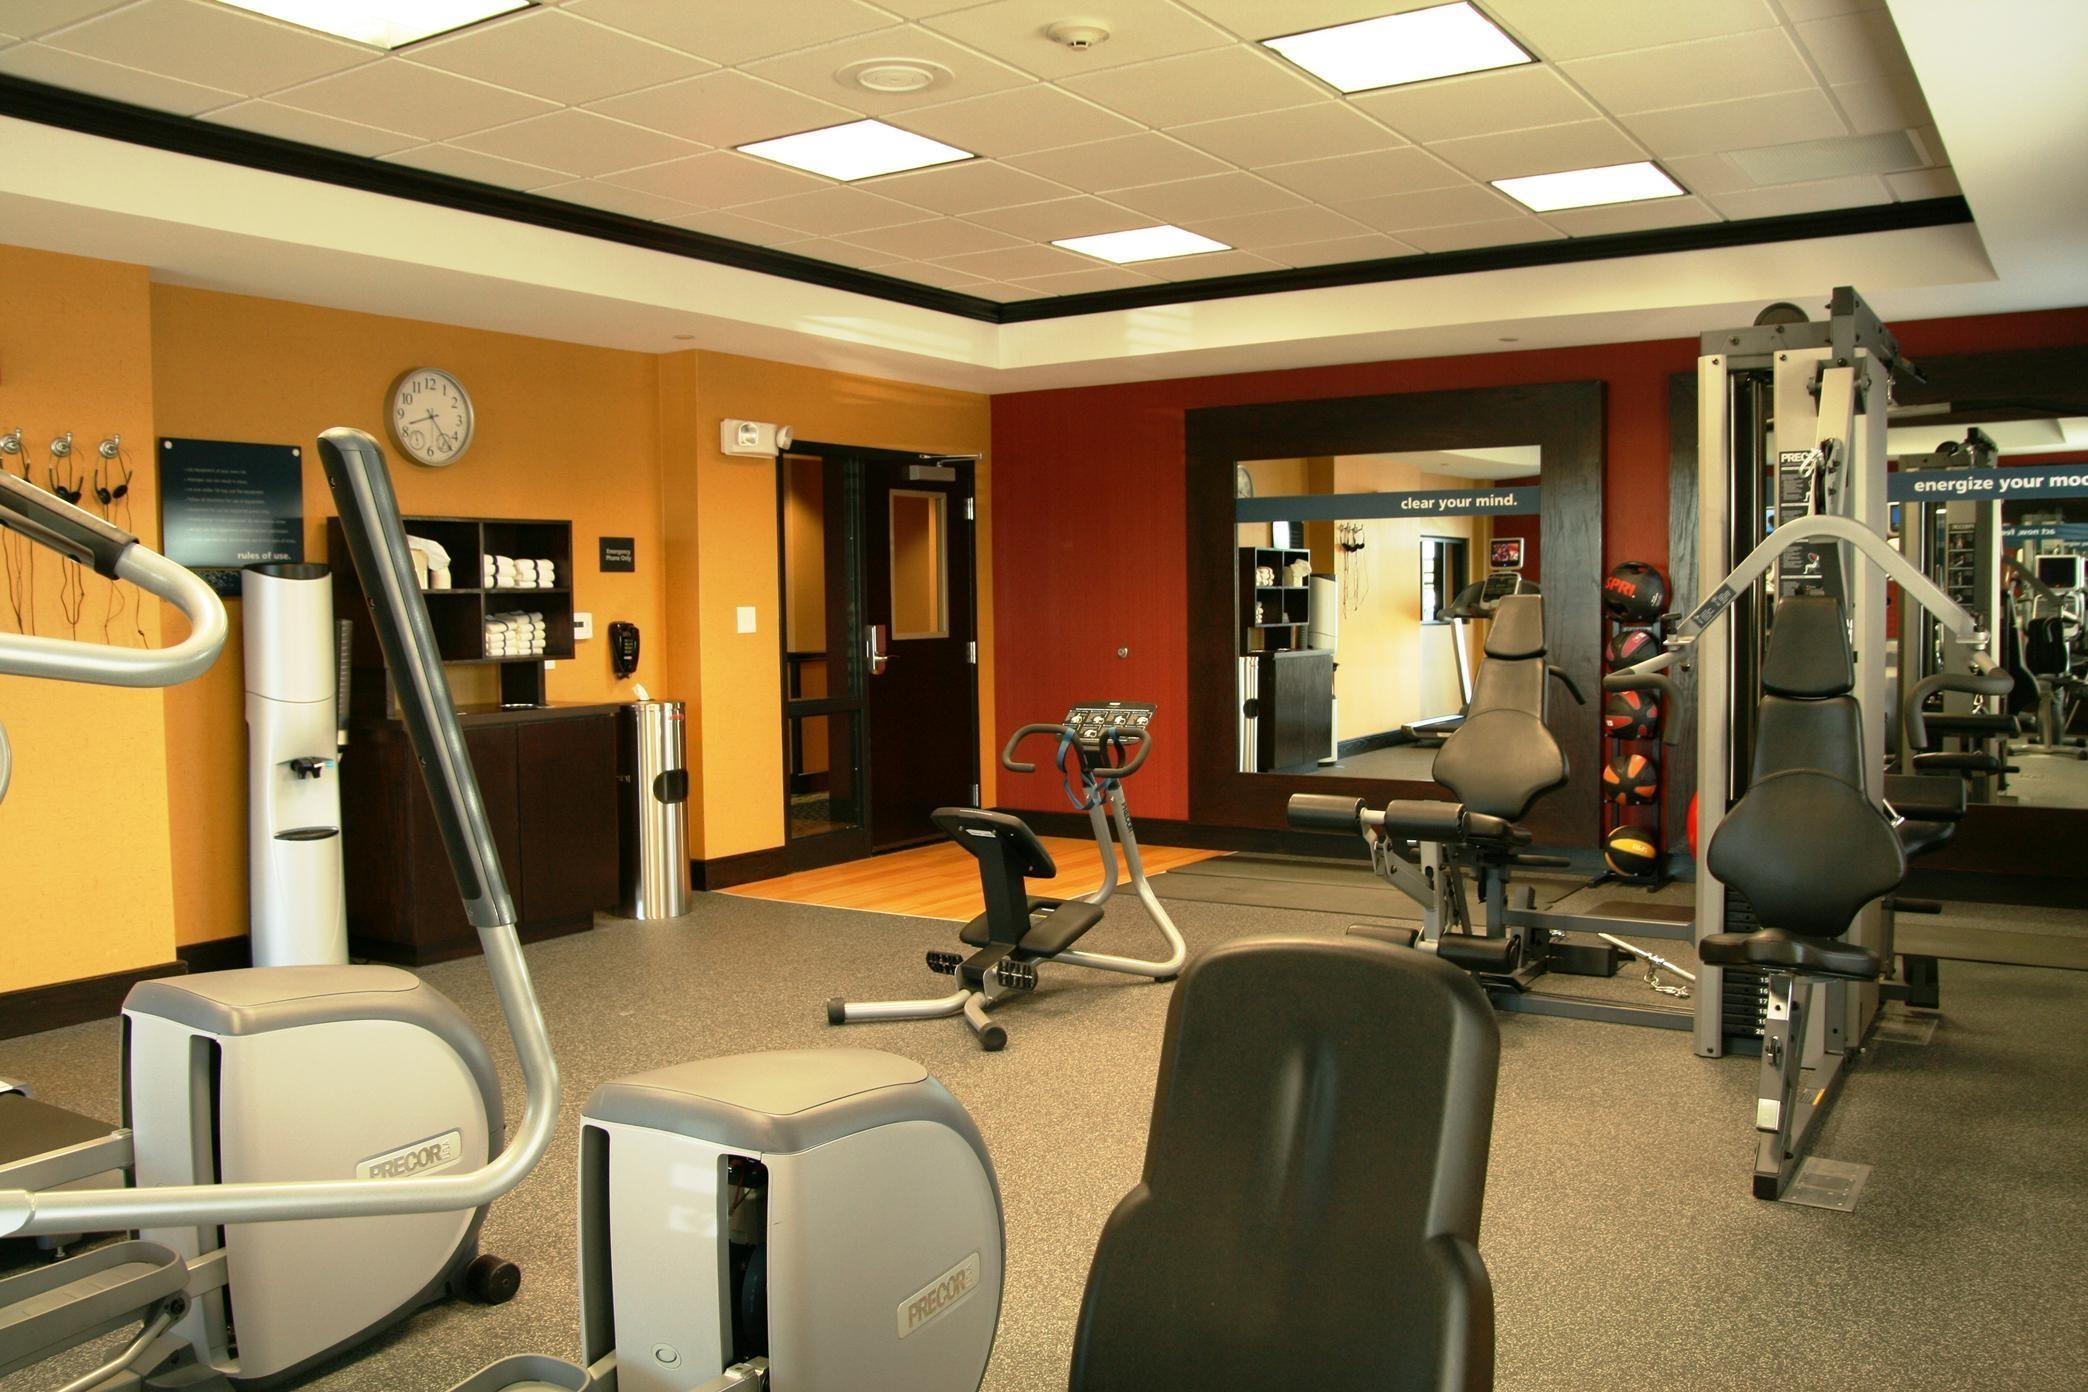 Hampton Inn & Suites Dallas/Lewisville-Vista Ridge Mall, TX image 32